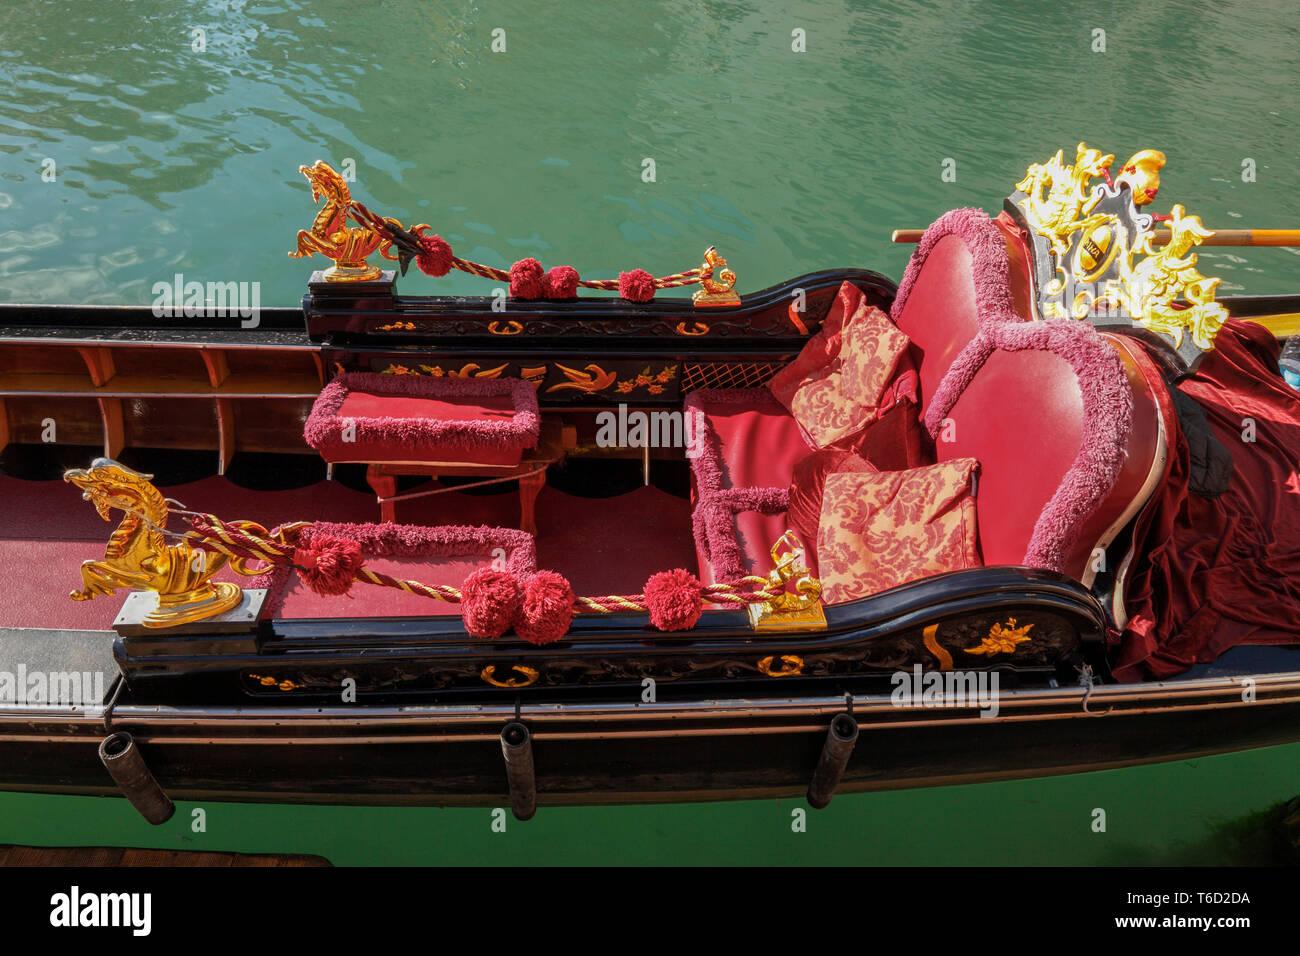 Decorative Gondola, Venice; Veneto; Italia, Europe. - Stock Image